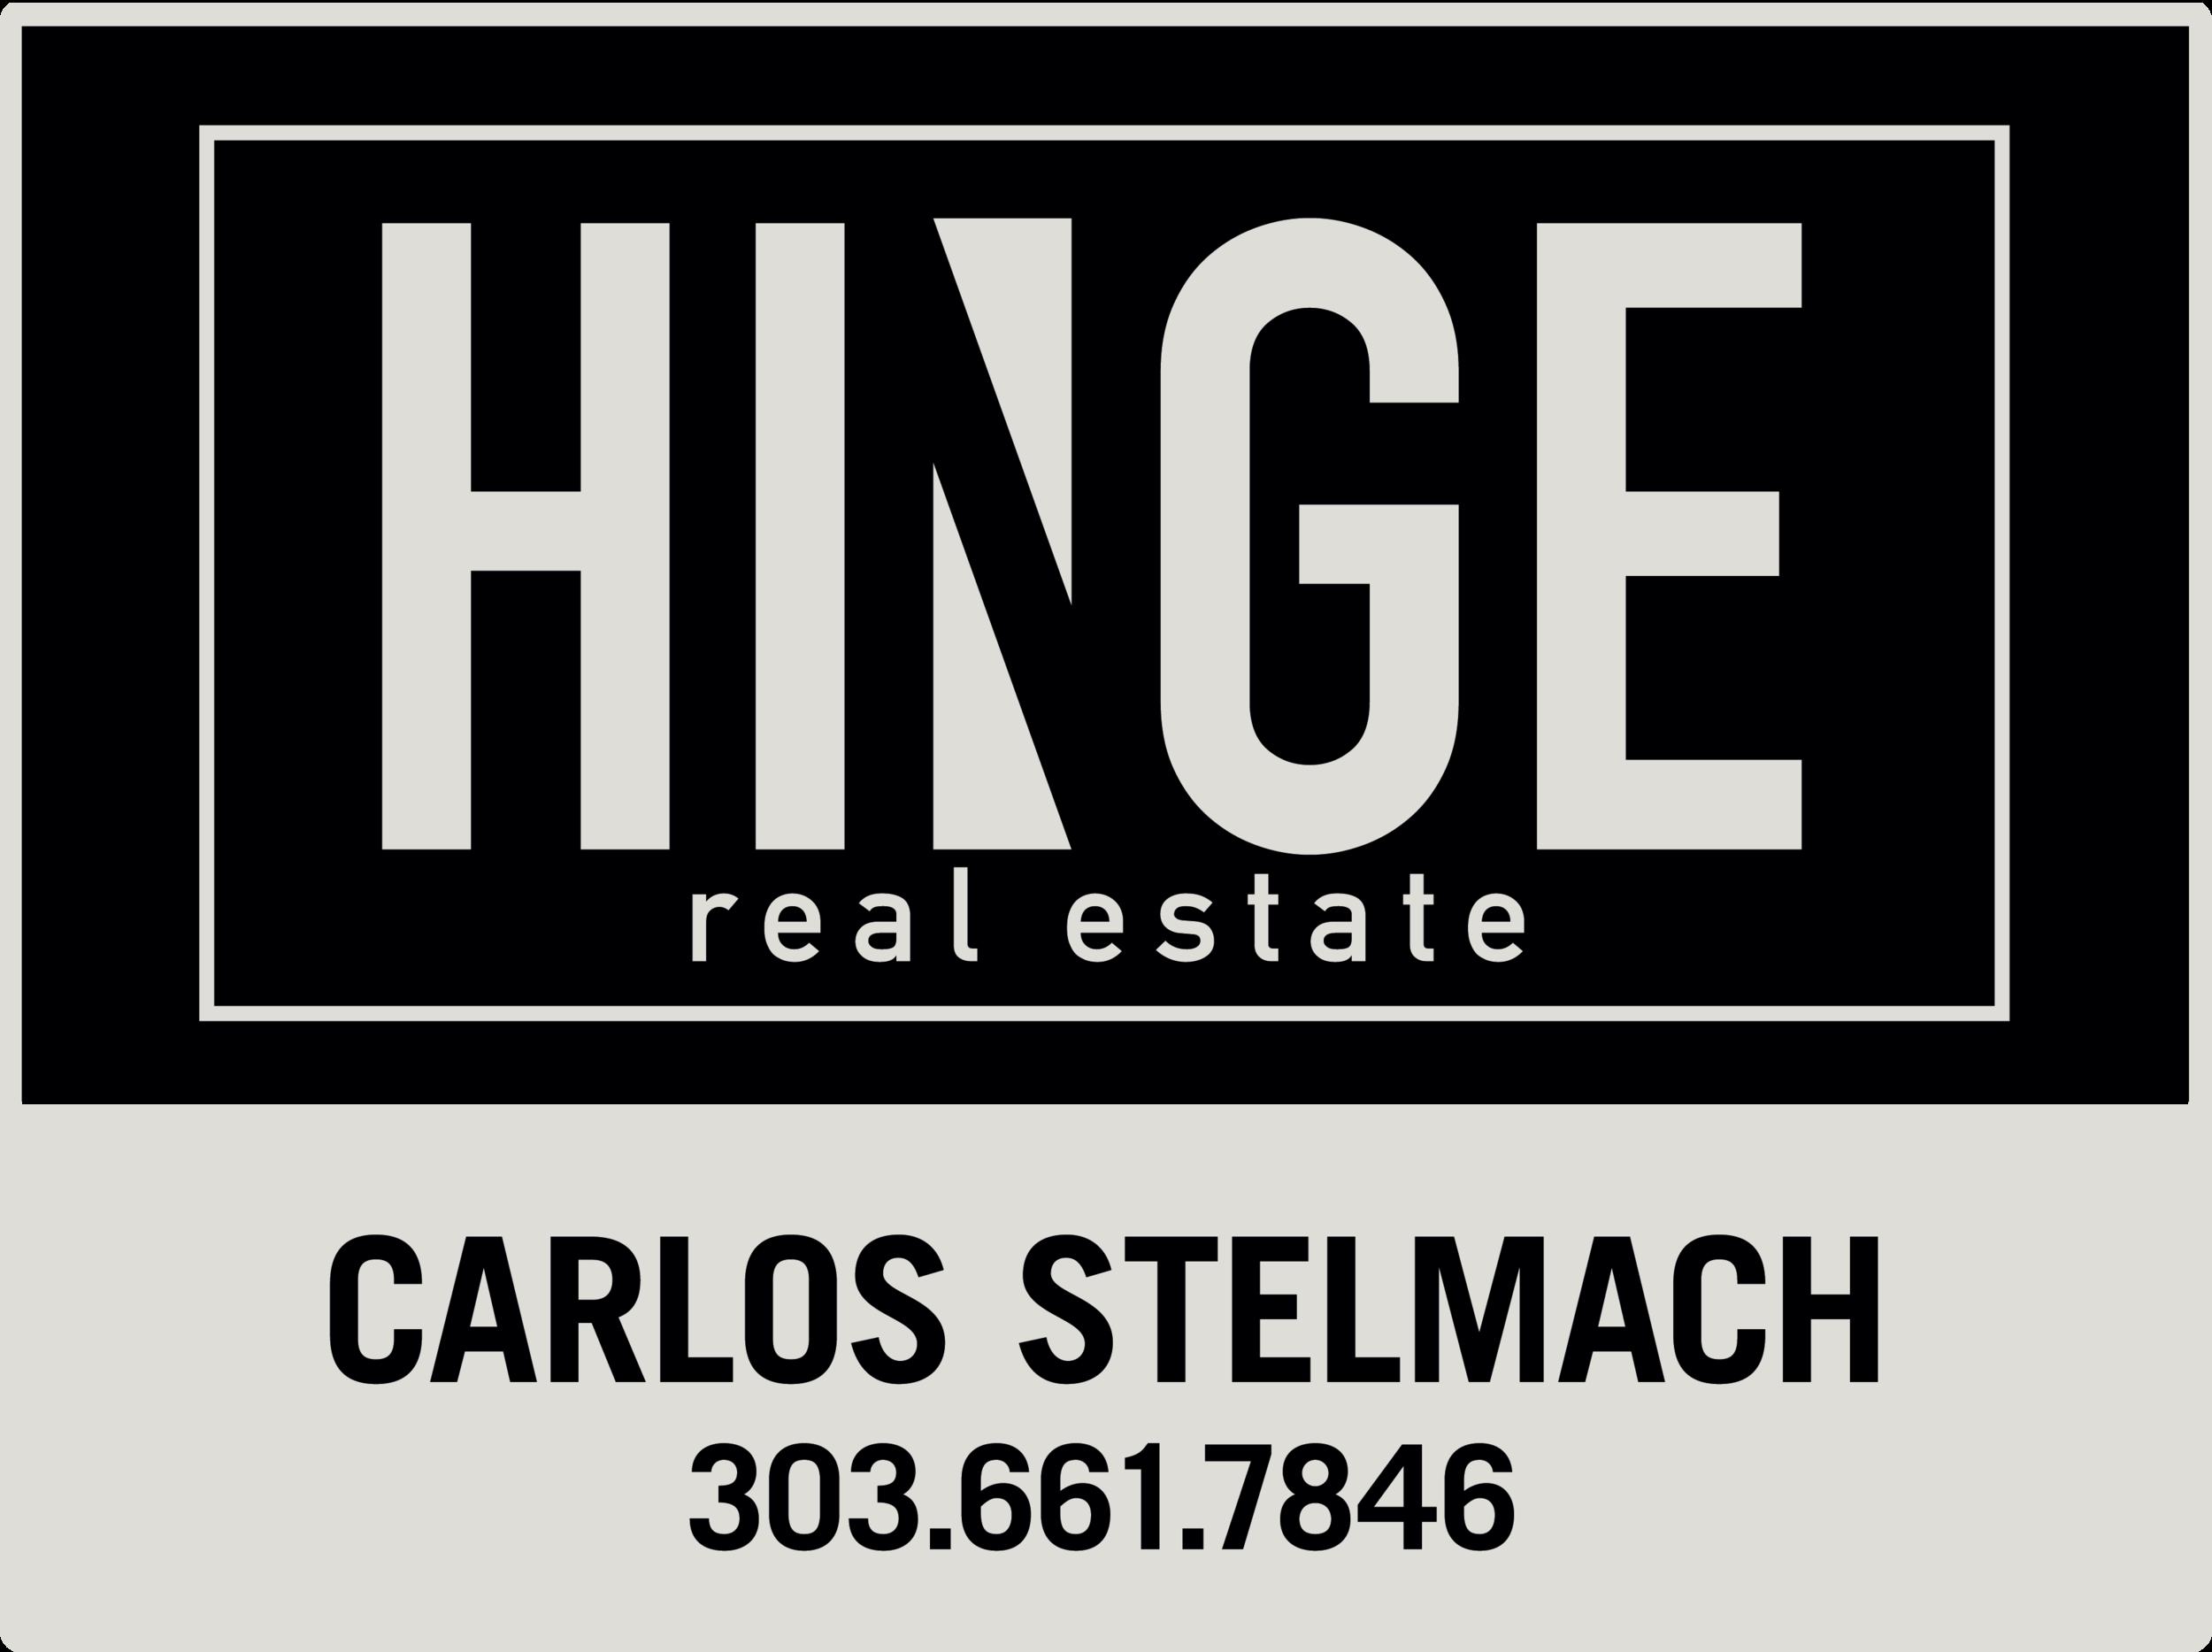 Hinge RE Carlos Stelmach 18x24 FOR SALE SIGN Rev1 Proof 04-22-19-01.png